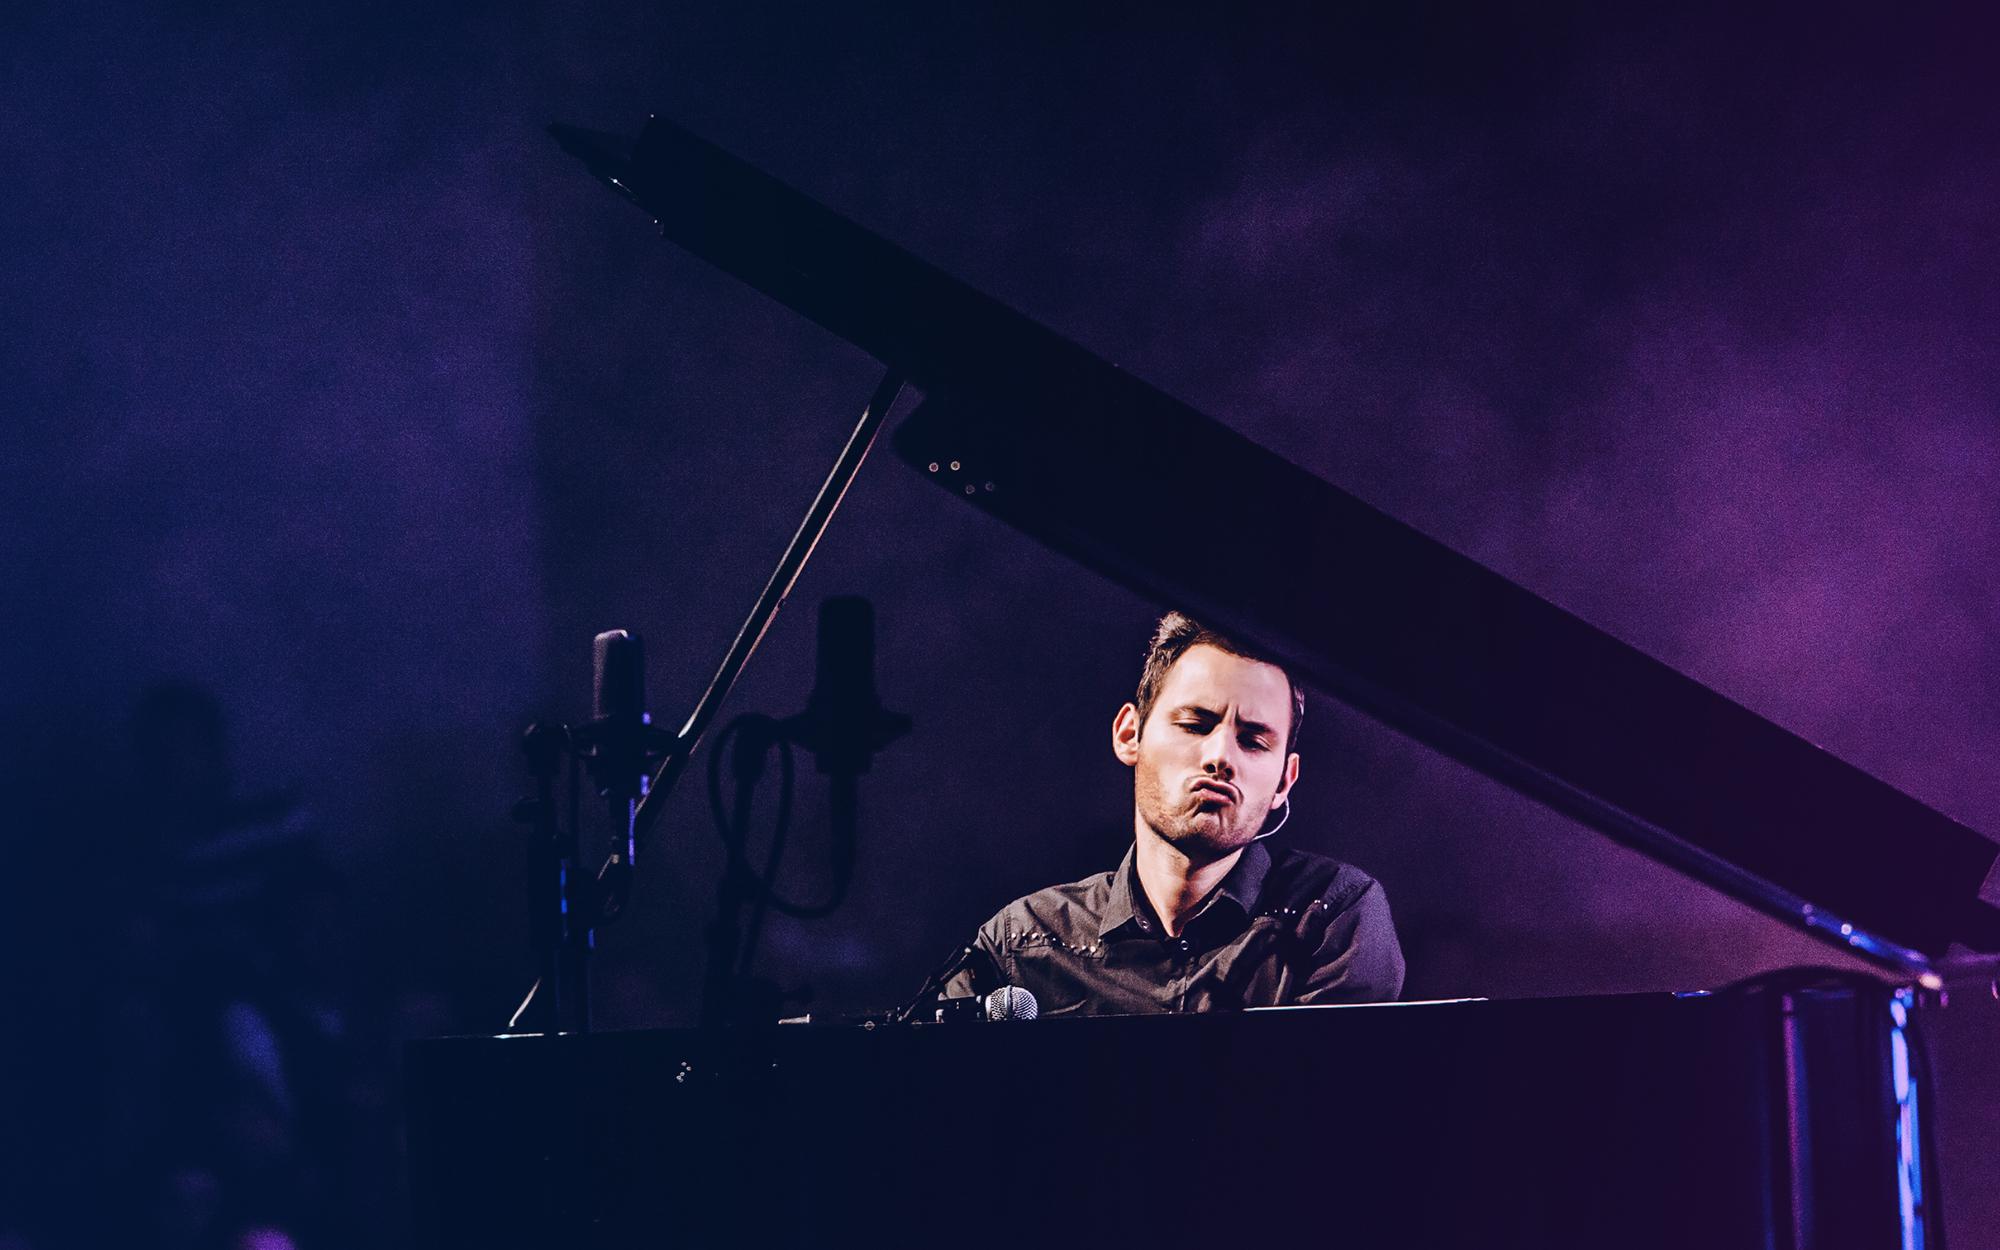 Peter Bence: Gram na fortepianie jak na perkusji!